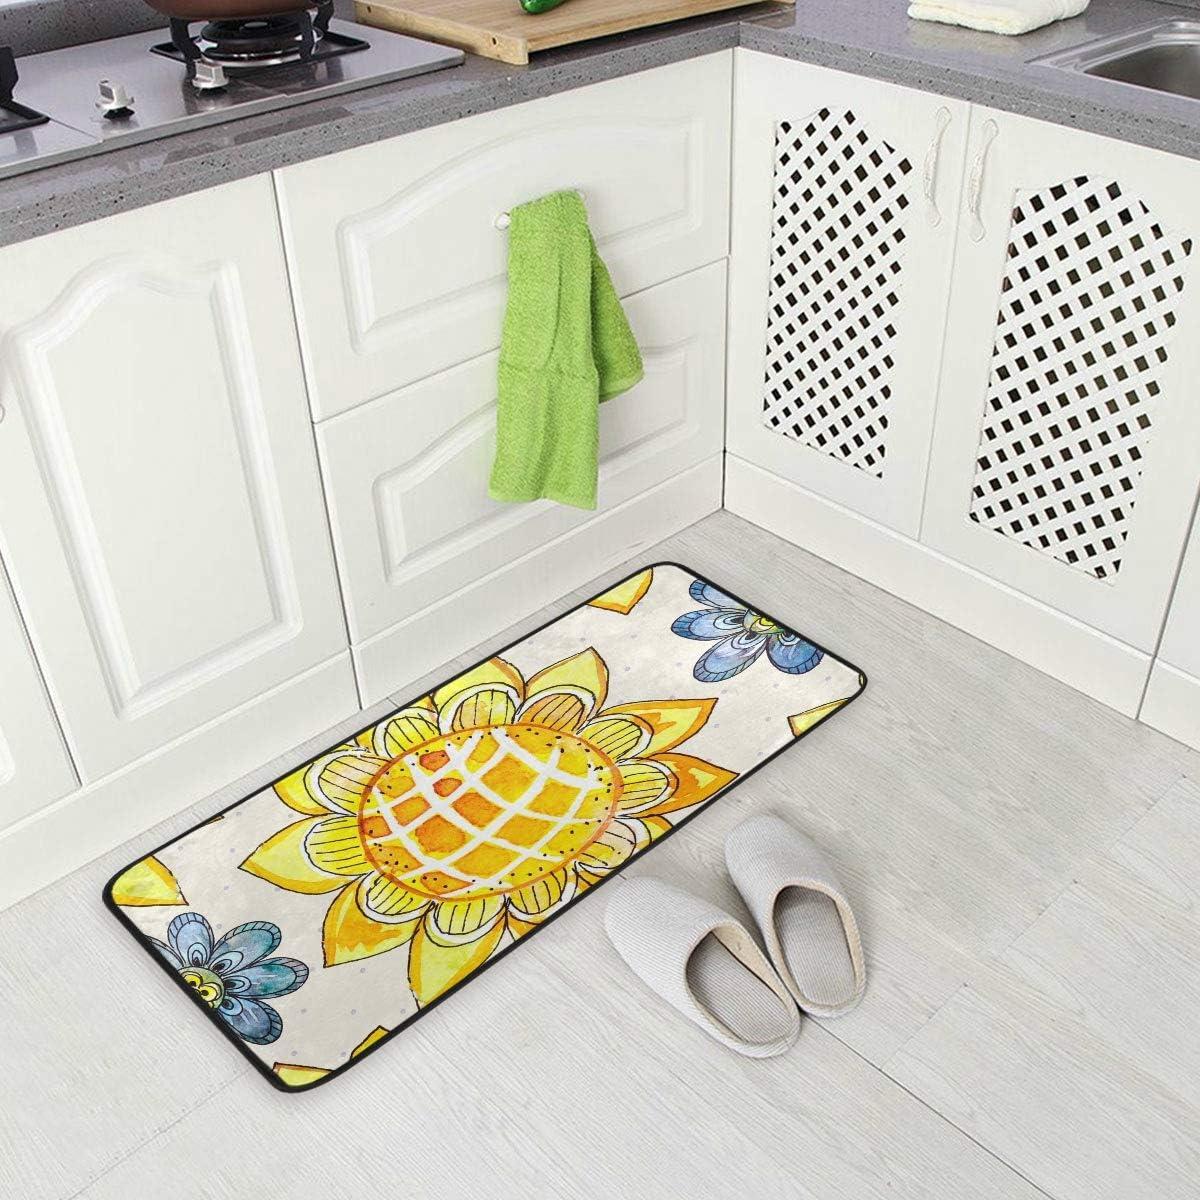 Amazon Com Kitchen Rugs Sunflower Cartoon Design Non Slip Soft Kitchen Mats Bath Rug Runner Doormats Carpet For Home Decor 39 X 20 Kitchen Dining